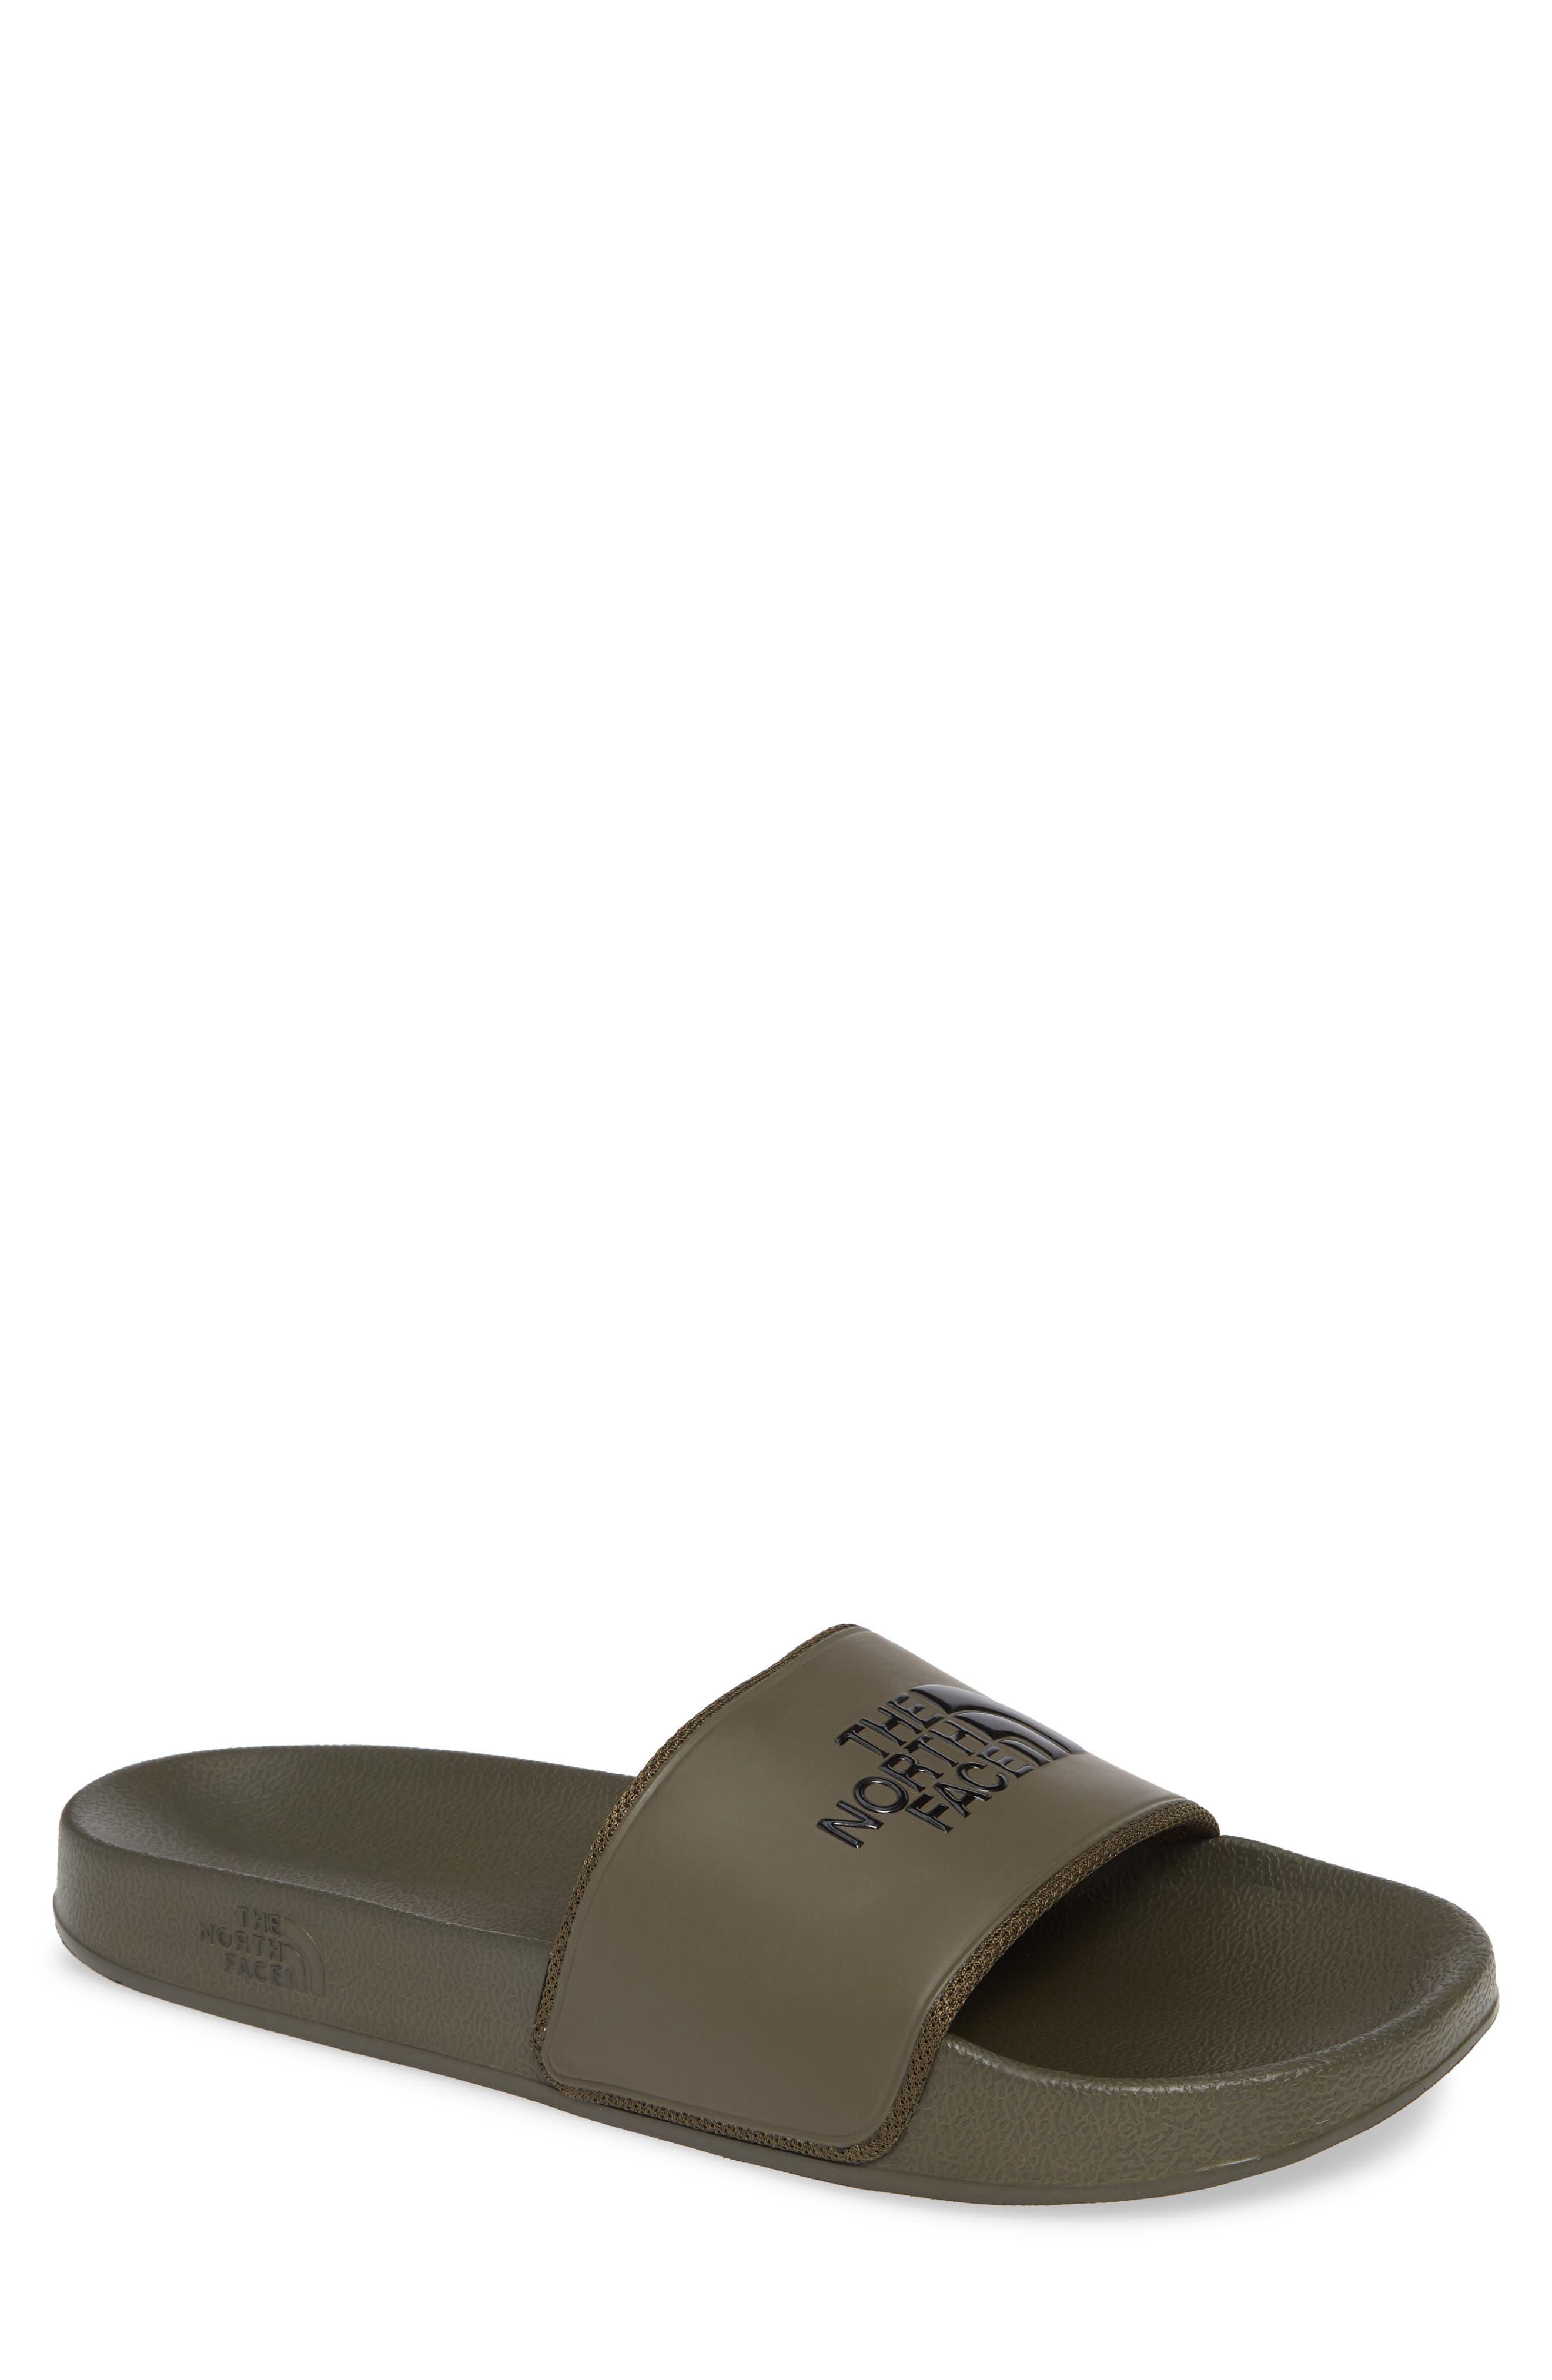 Base Camp II Slide Sandal,                         Main,                         color, TARMAC GREEN/ BLACK